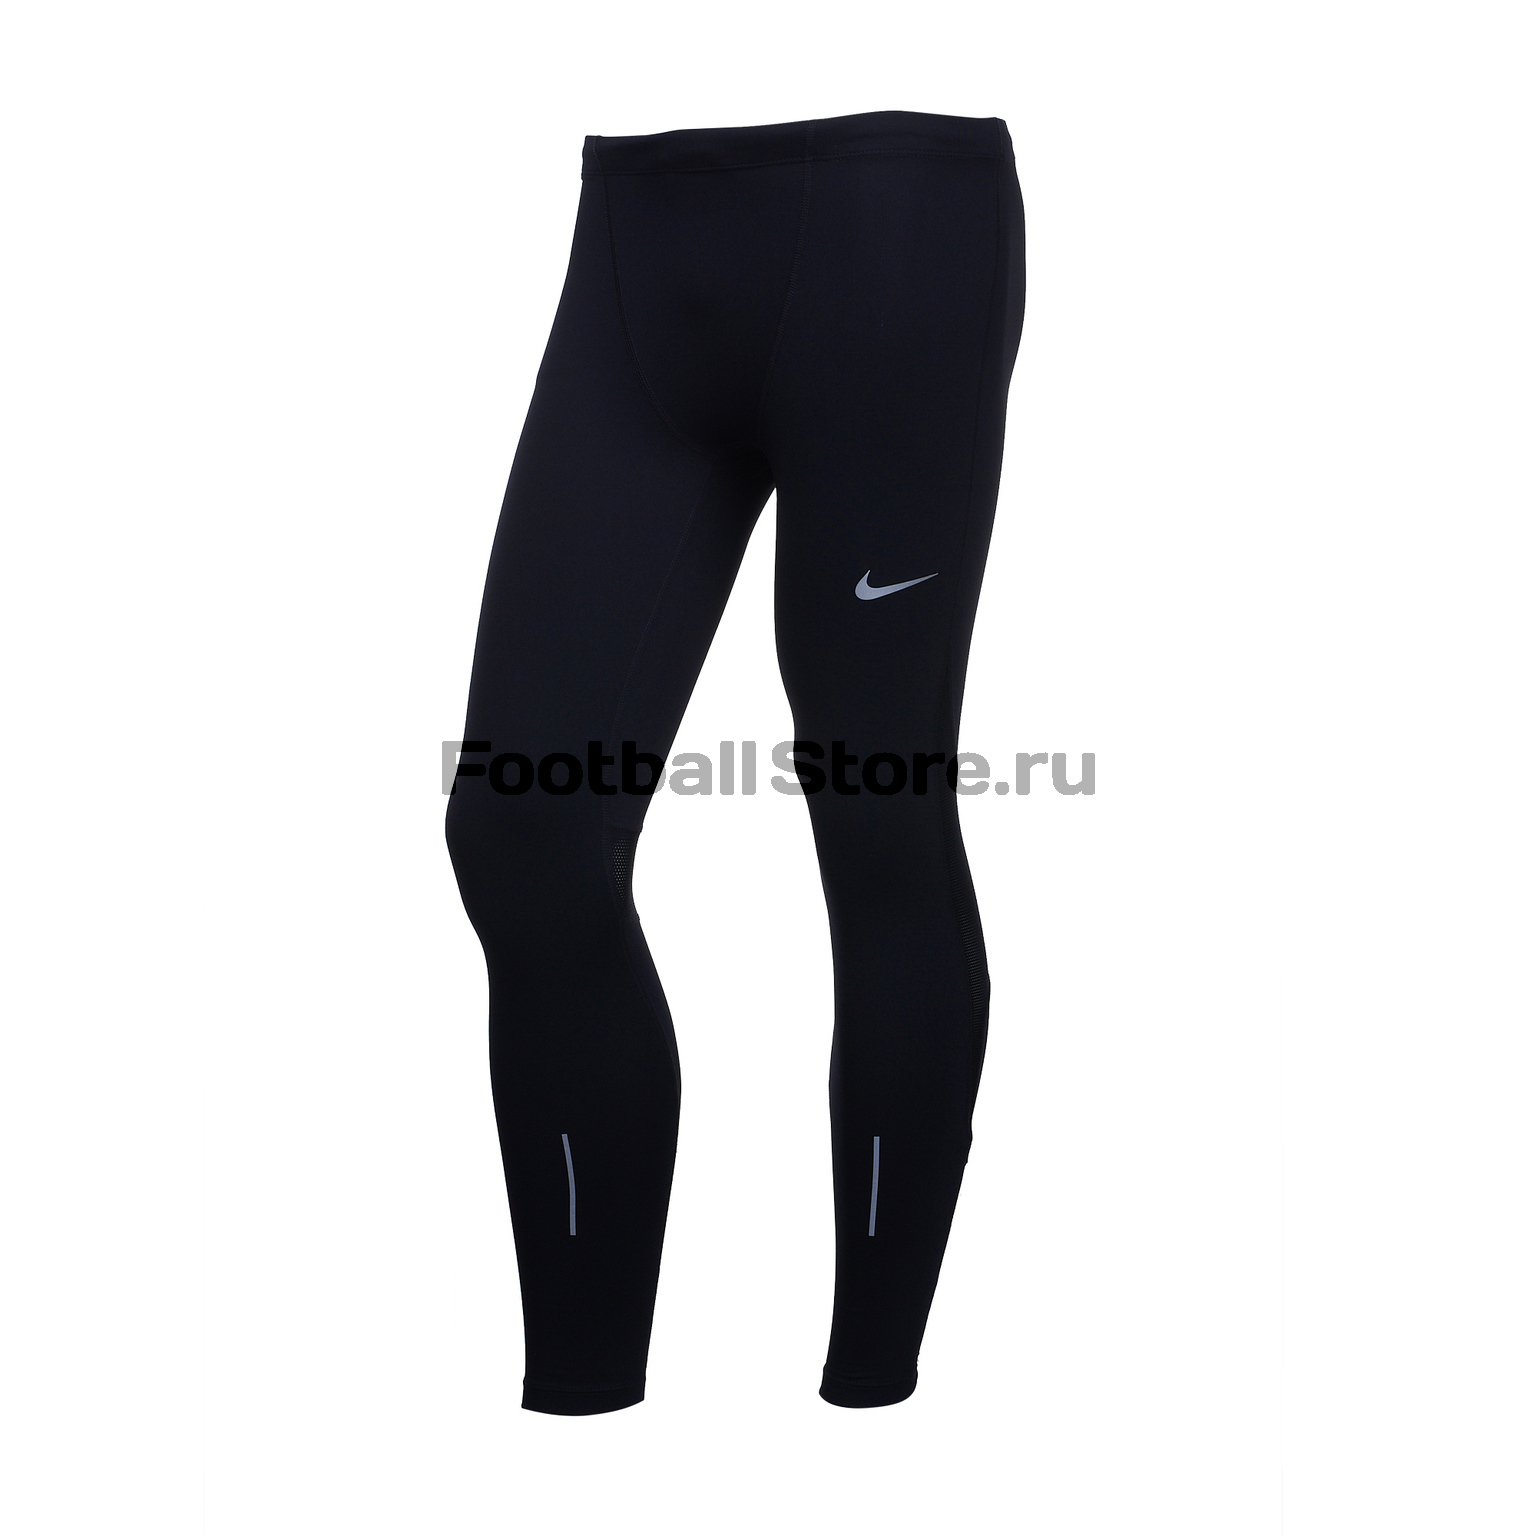 Белье лосины Nike Run TGHT 856886-010 бейсболка nike run aw84 651659 413